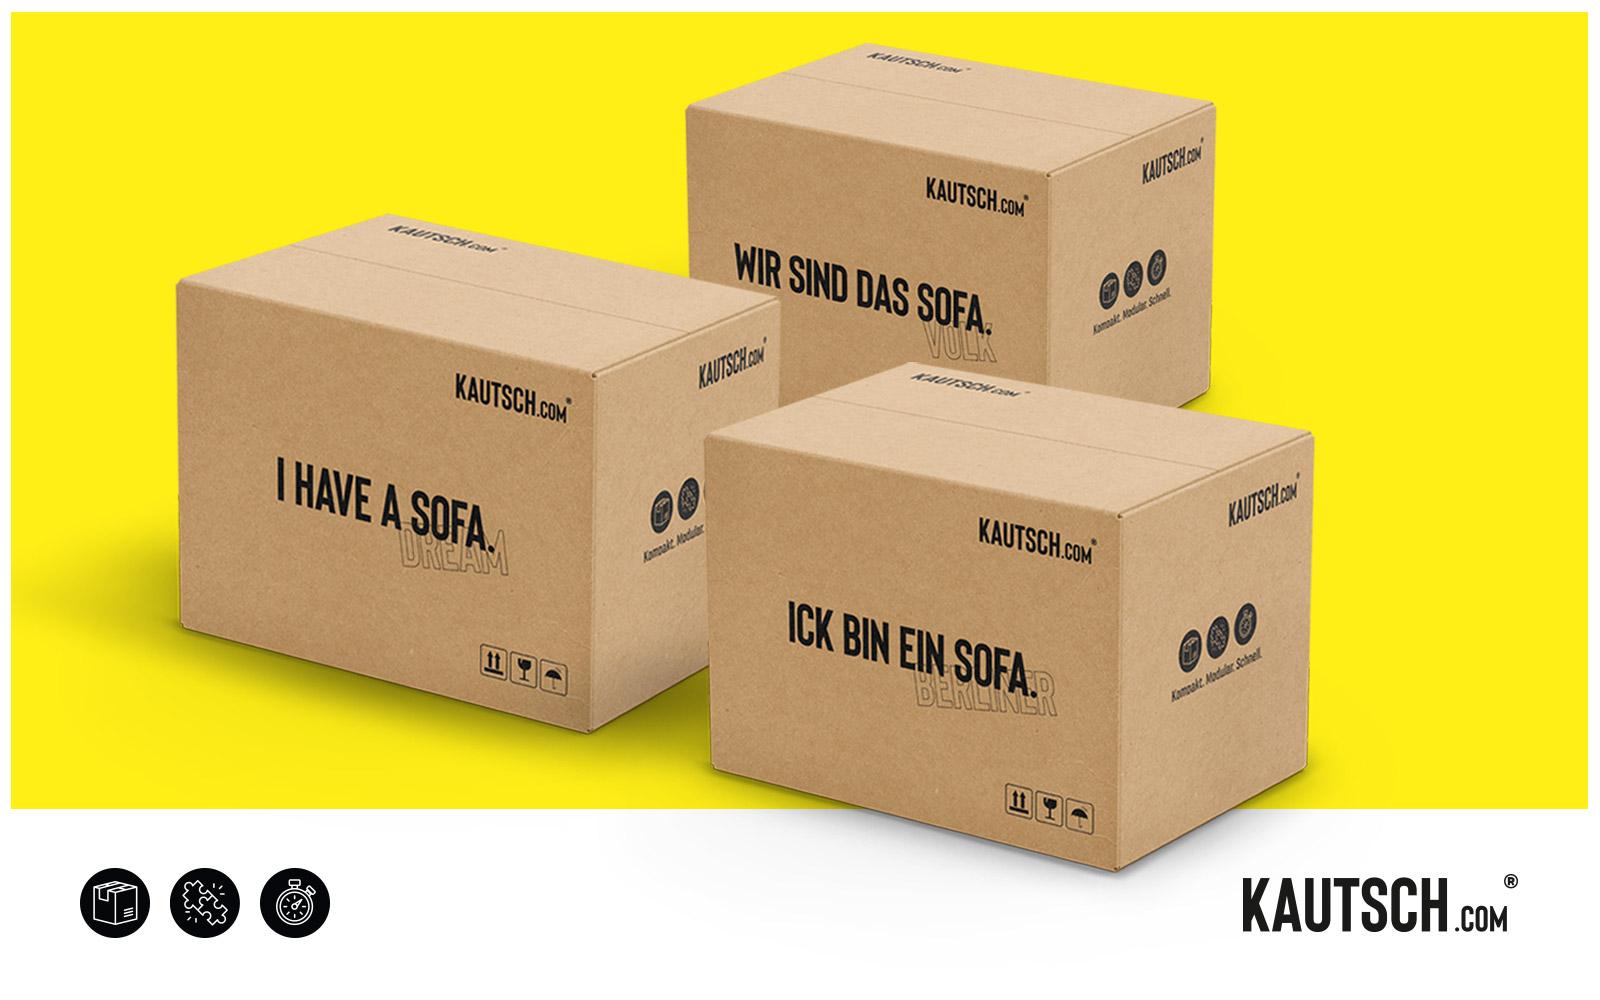 KAUTSCH.com – Kartons